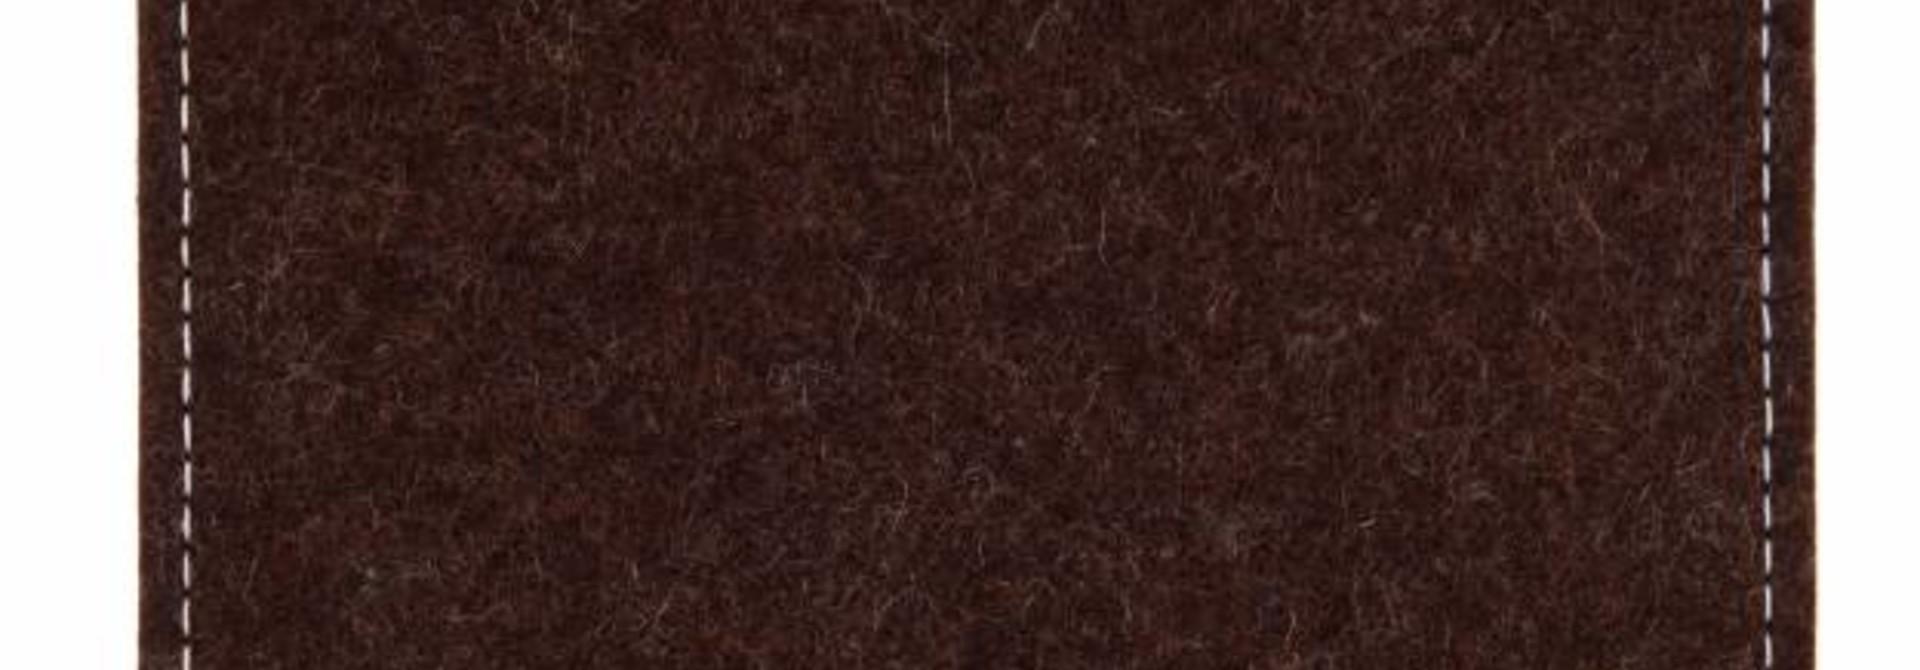 Sleeve Truffle-Brown